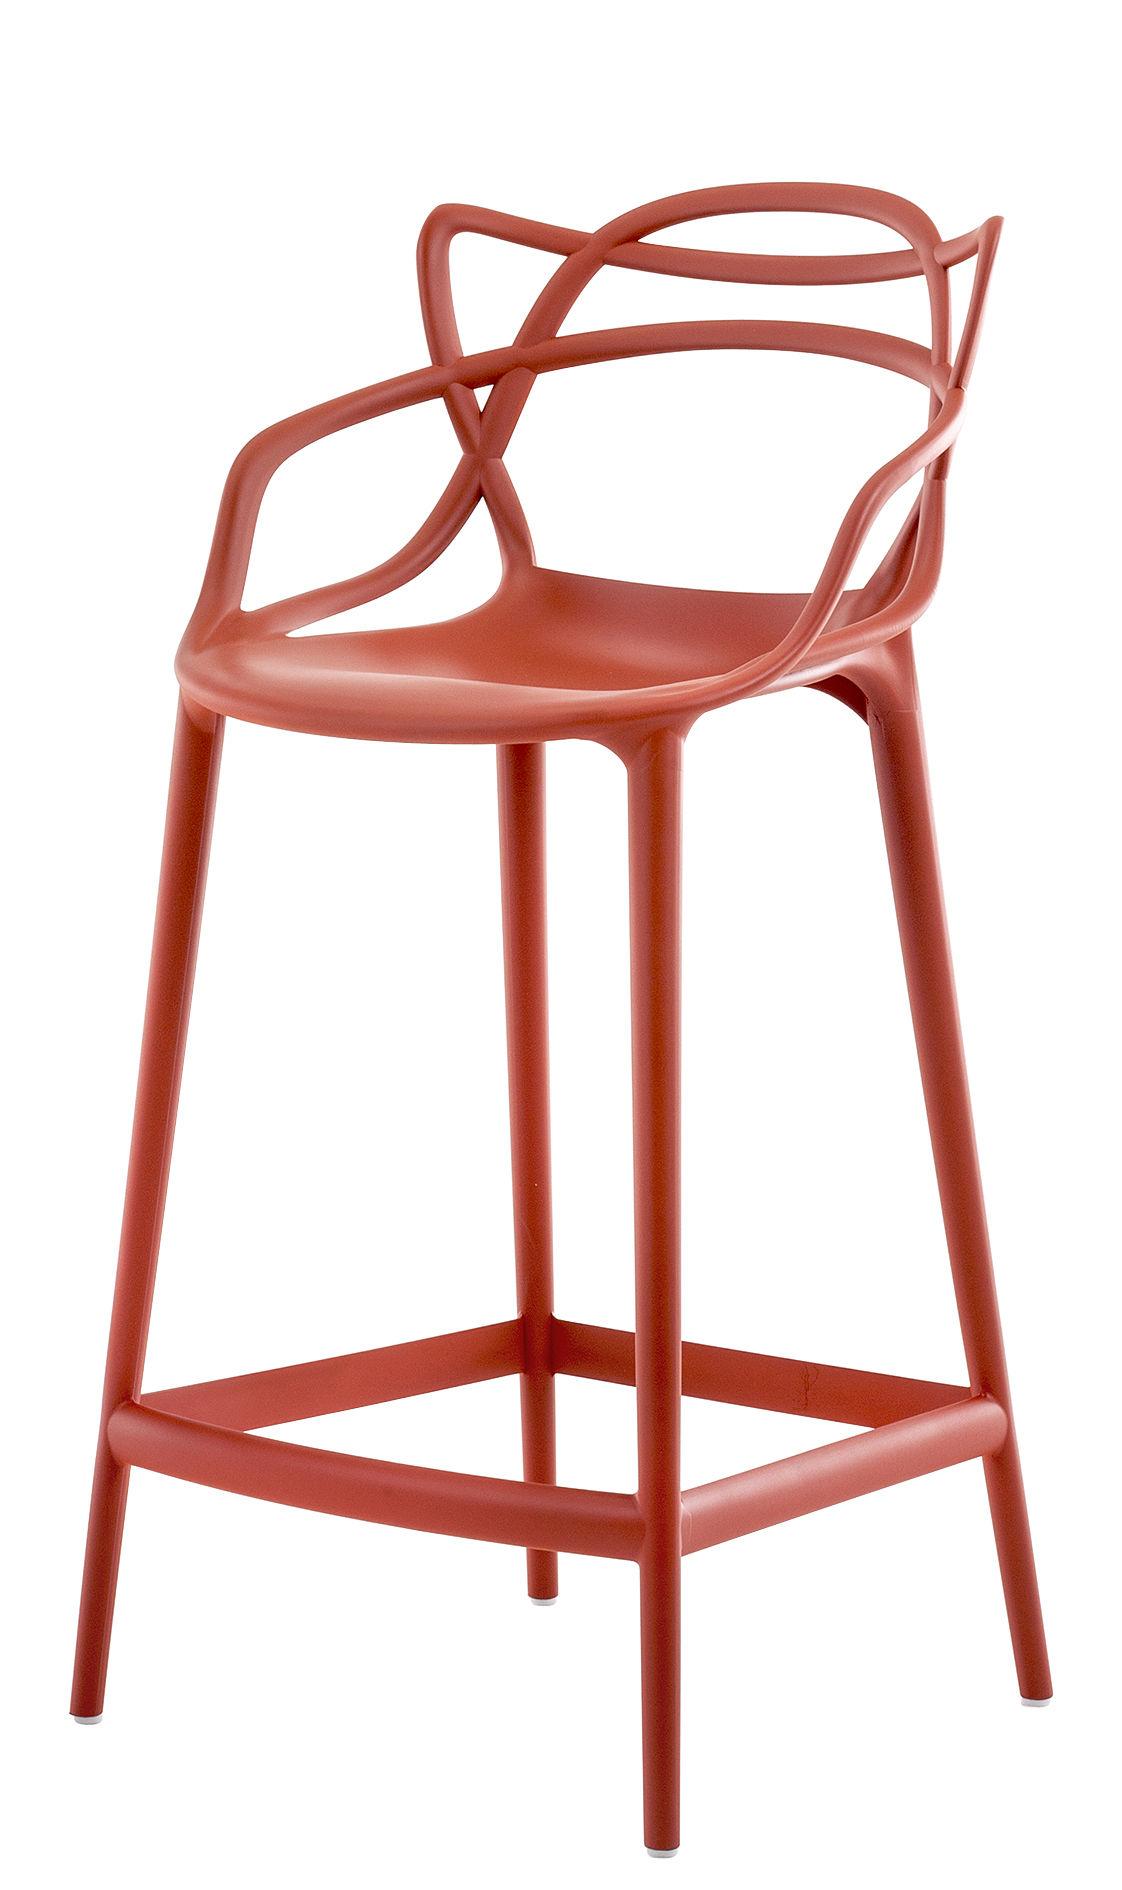 chaise de bar masters h 65 cm polypropyl ne orange. Black Bedroom Furniture Sets. Home Design Ideas